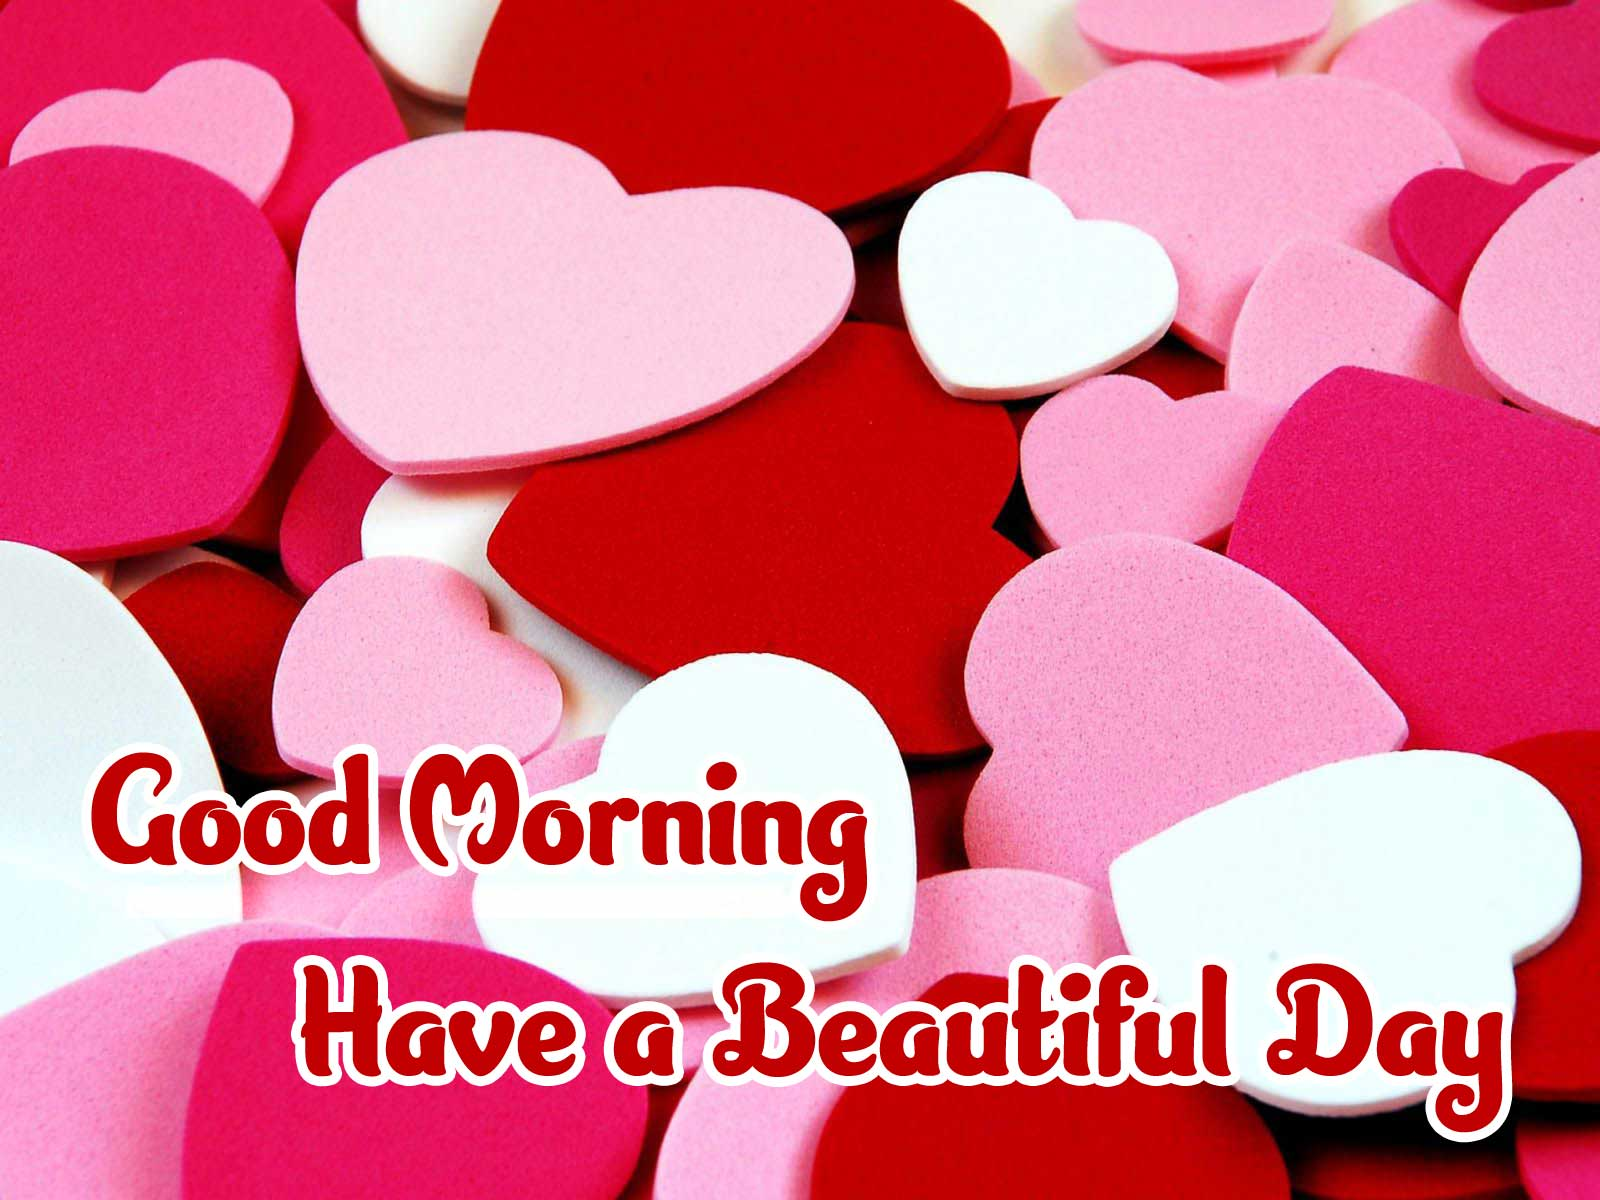 Amazing 1080 p Good Morning 4k ImagesPhoto Pics Download